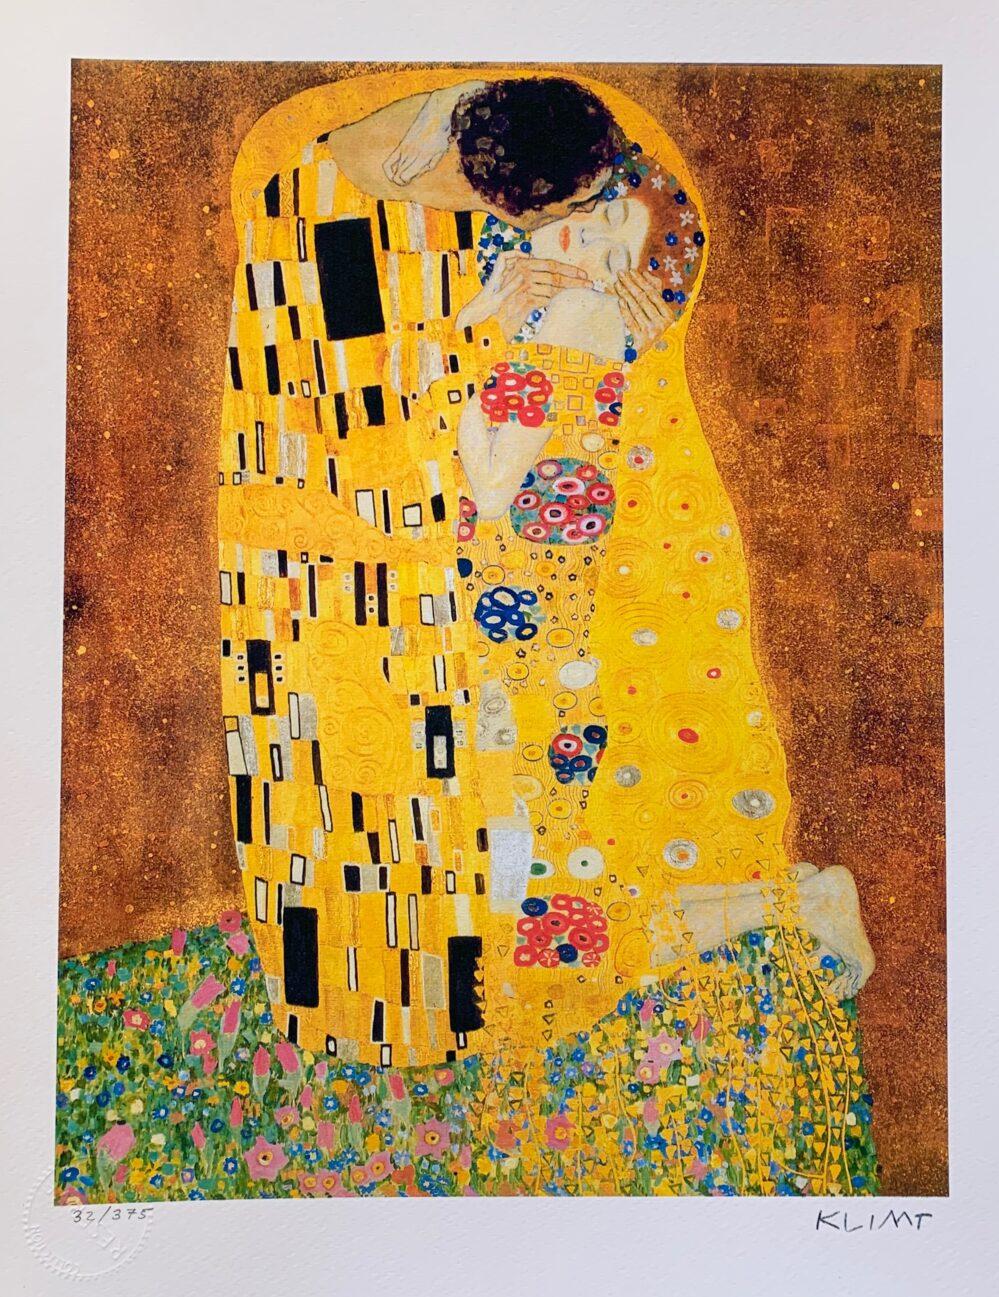 Gustav Klimt THE KISS Facsimile Signed Limited Edition Giclee